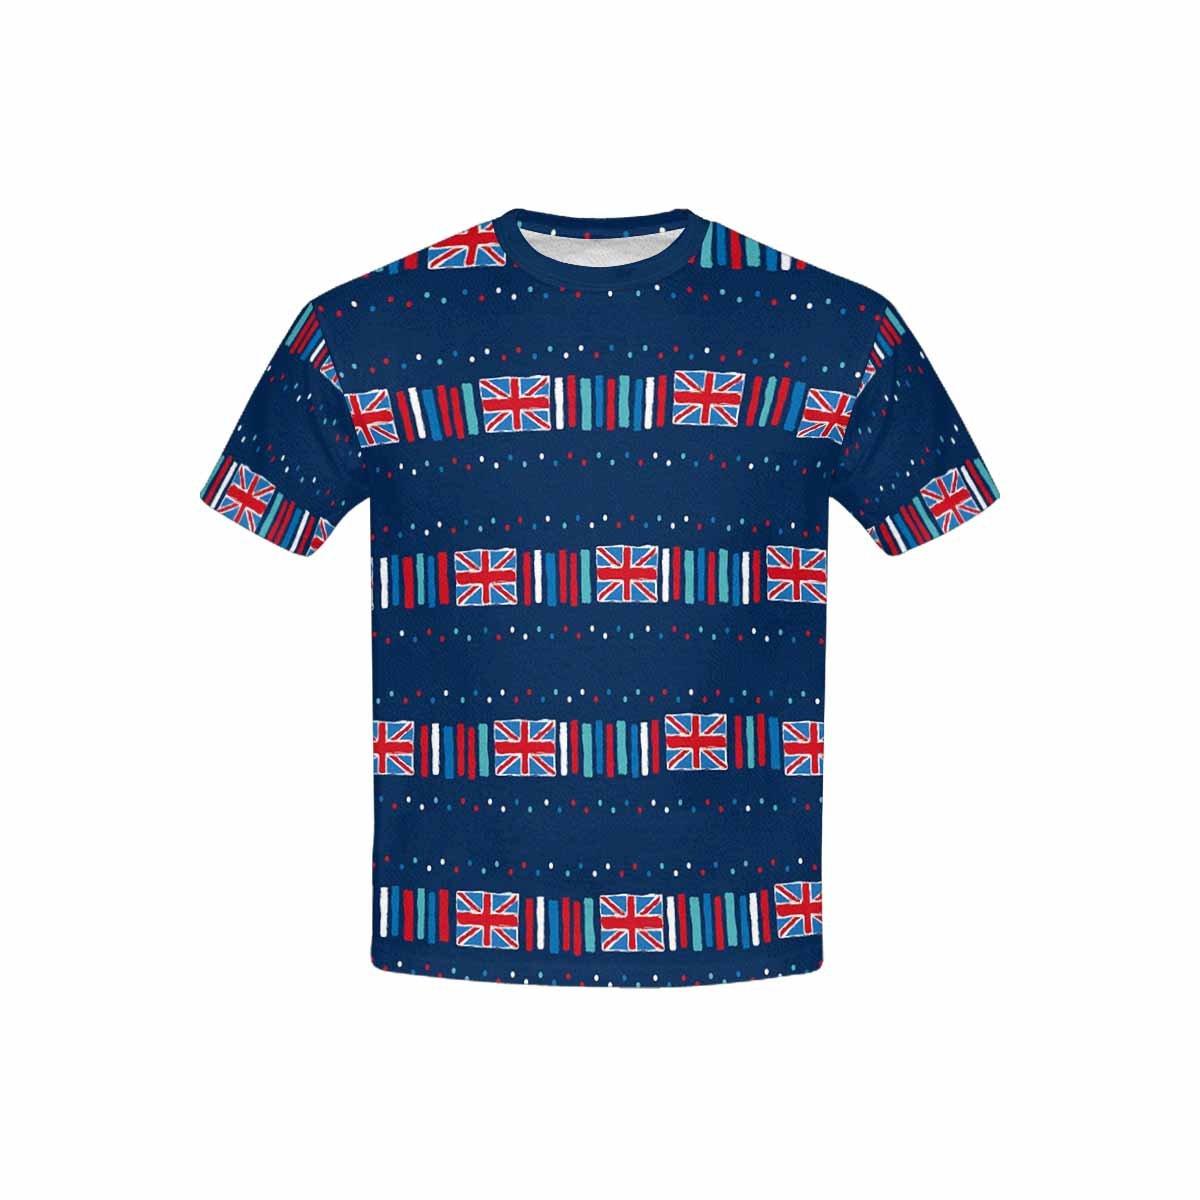 XS-XL INTERESTPRINT Childs T-Shirt Union Jack Dash